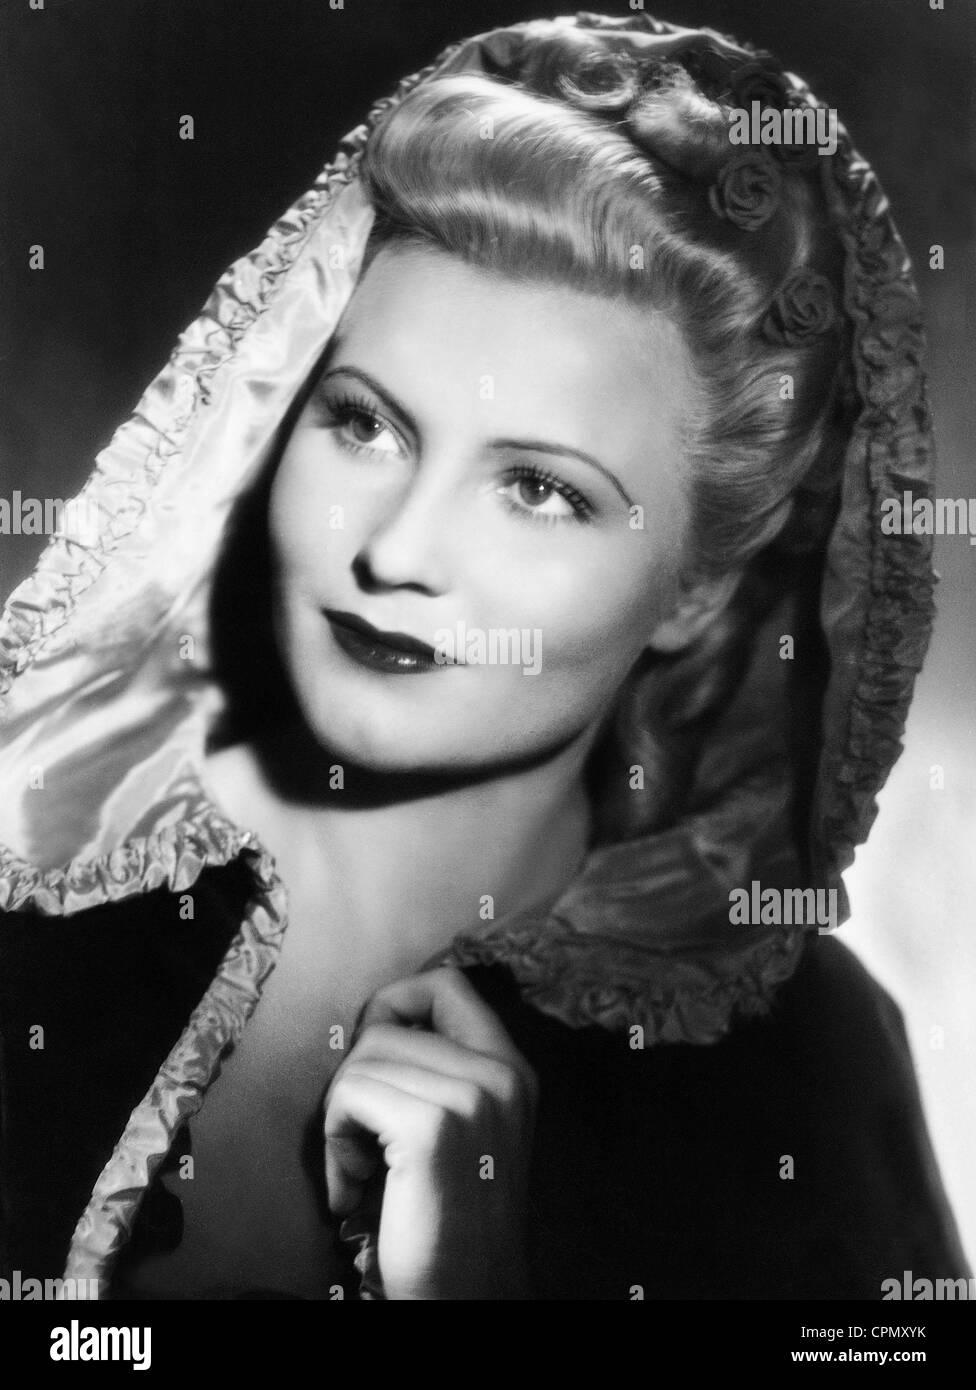 Winnie Markus in 'Whom the Gods Love', 1942 - Stock Image